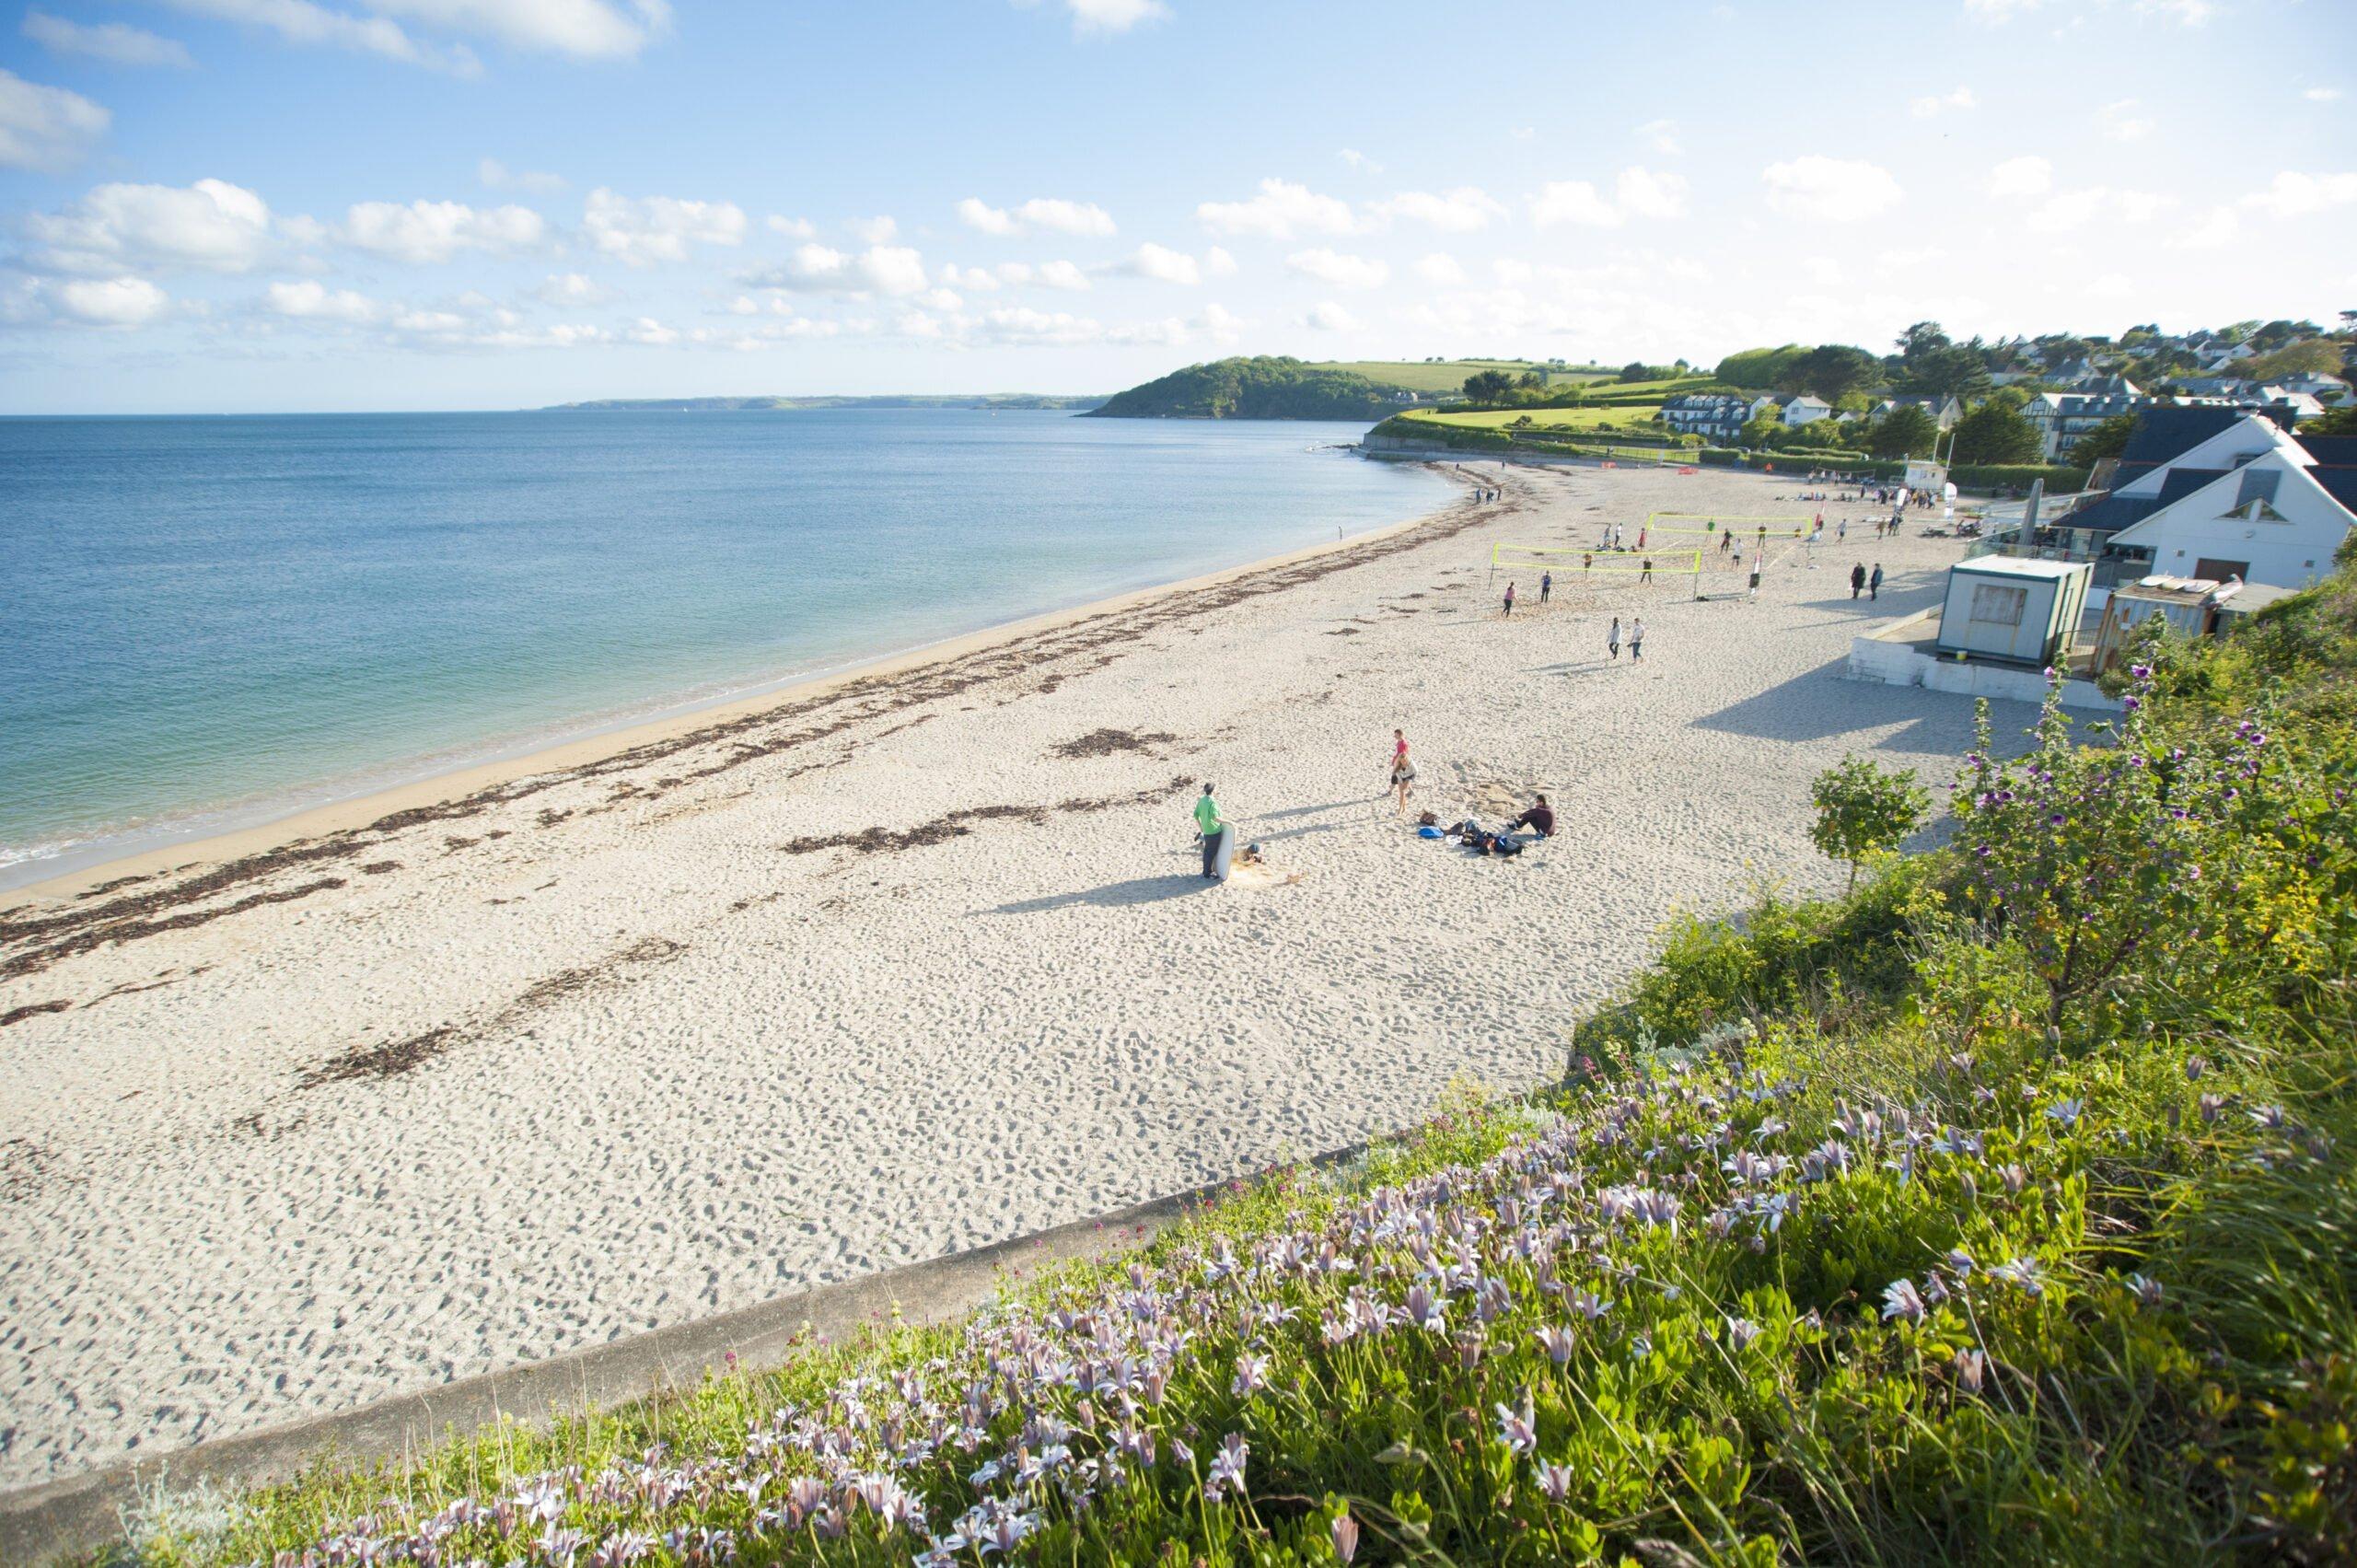 Cornish beaches: Gyllyngvase Beach